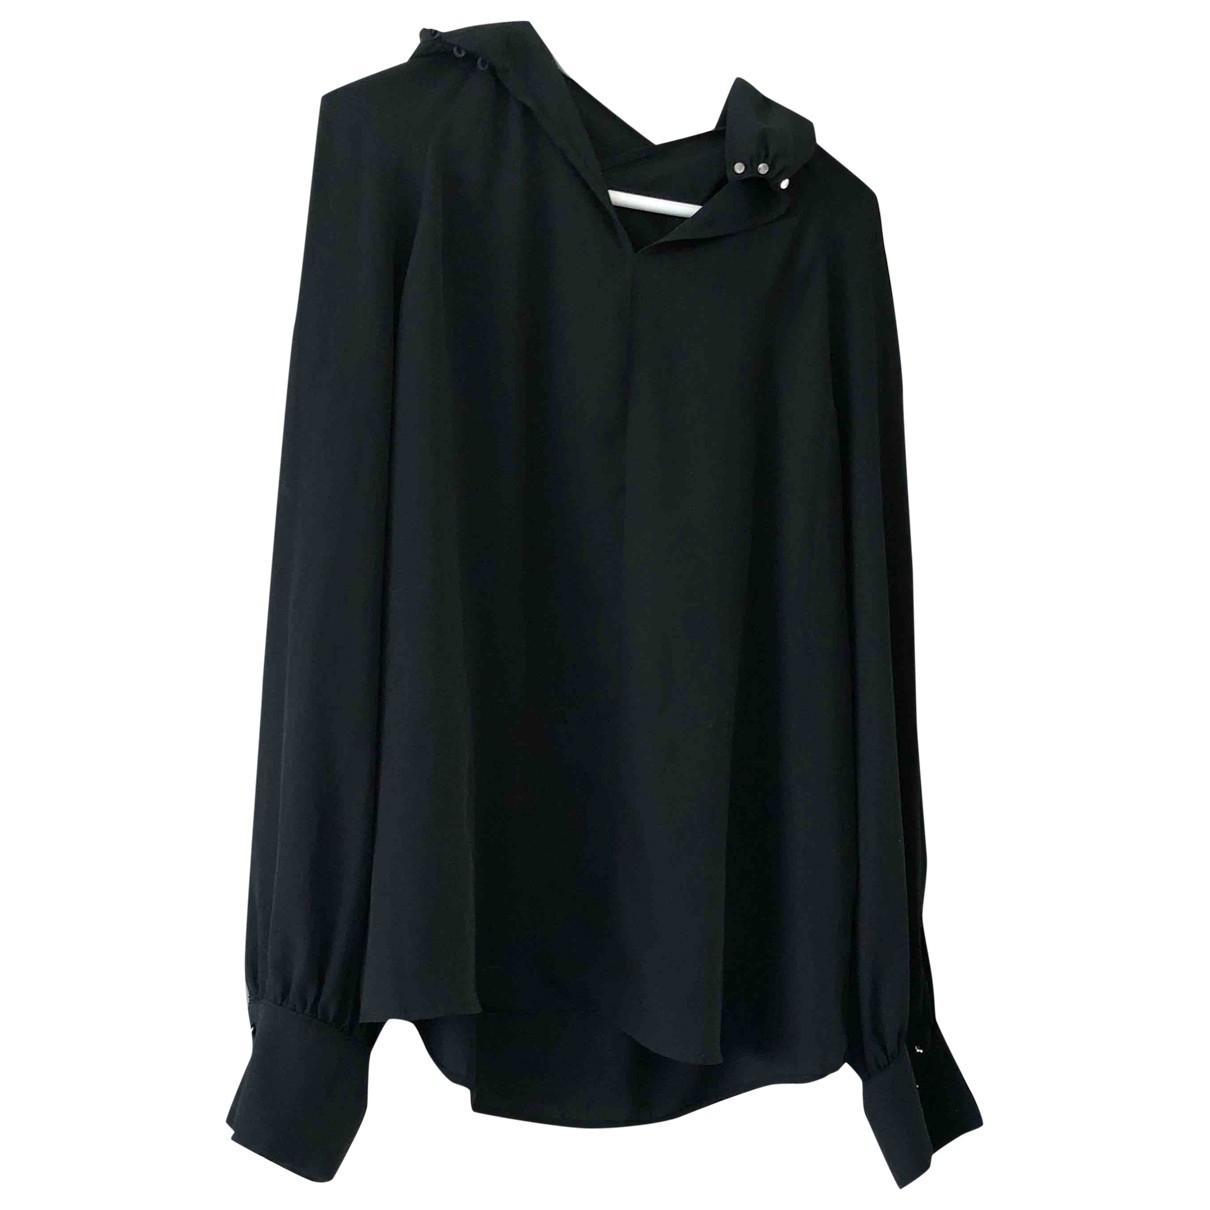 Zara \N Black  top for Women 38 FR